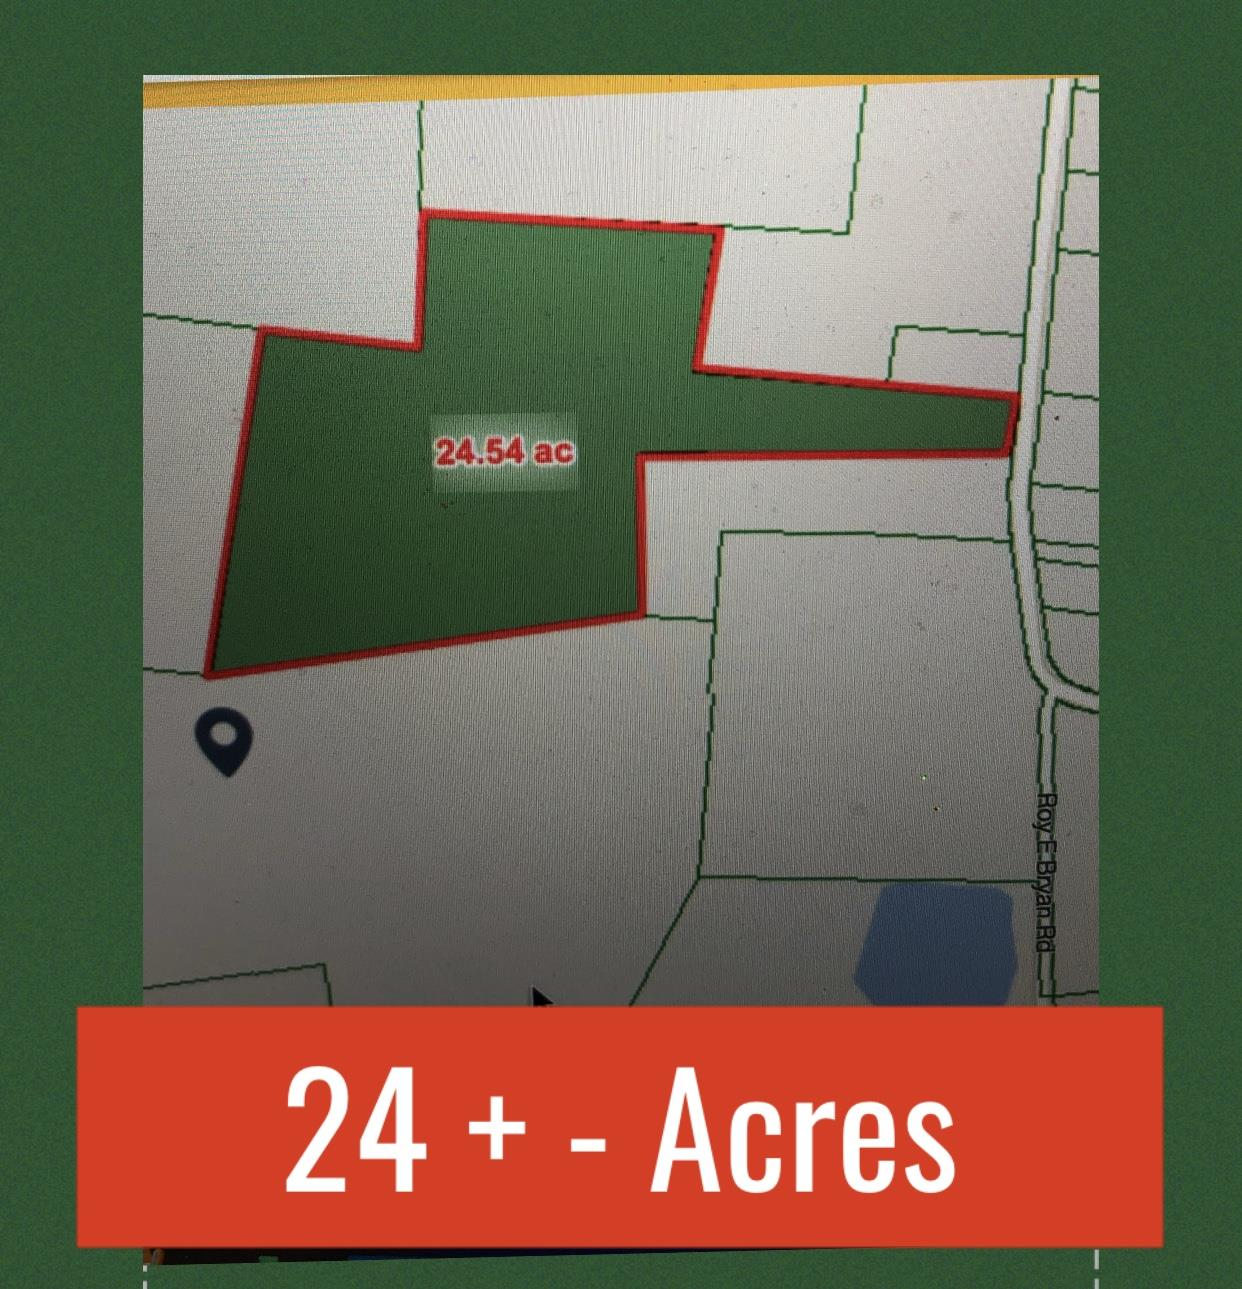 0 Simmons Rd (24 acres), Hillsboro, TN 37342 - Hillsboro, TN real estate listing